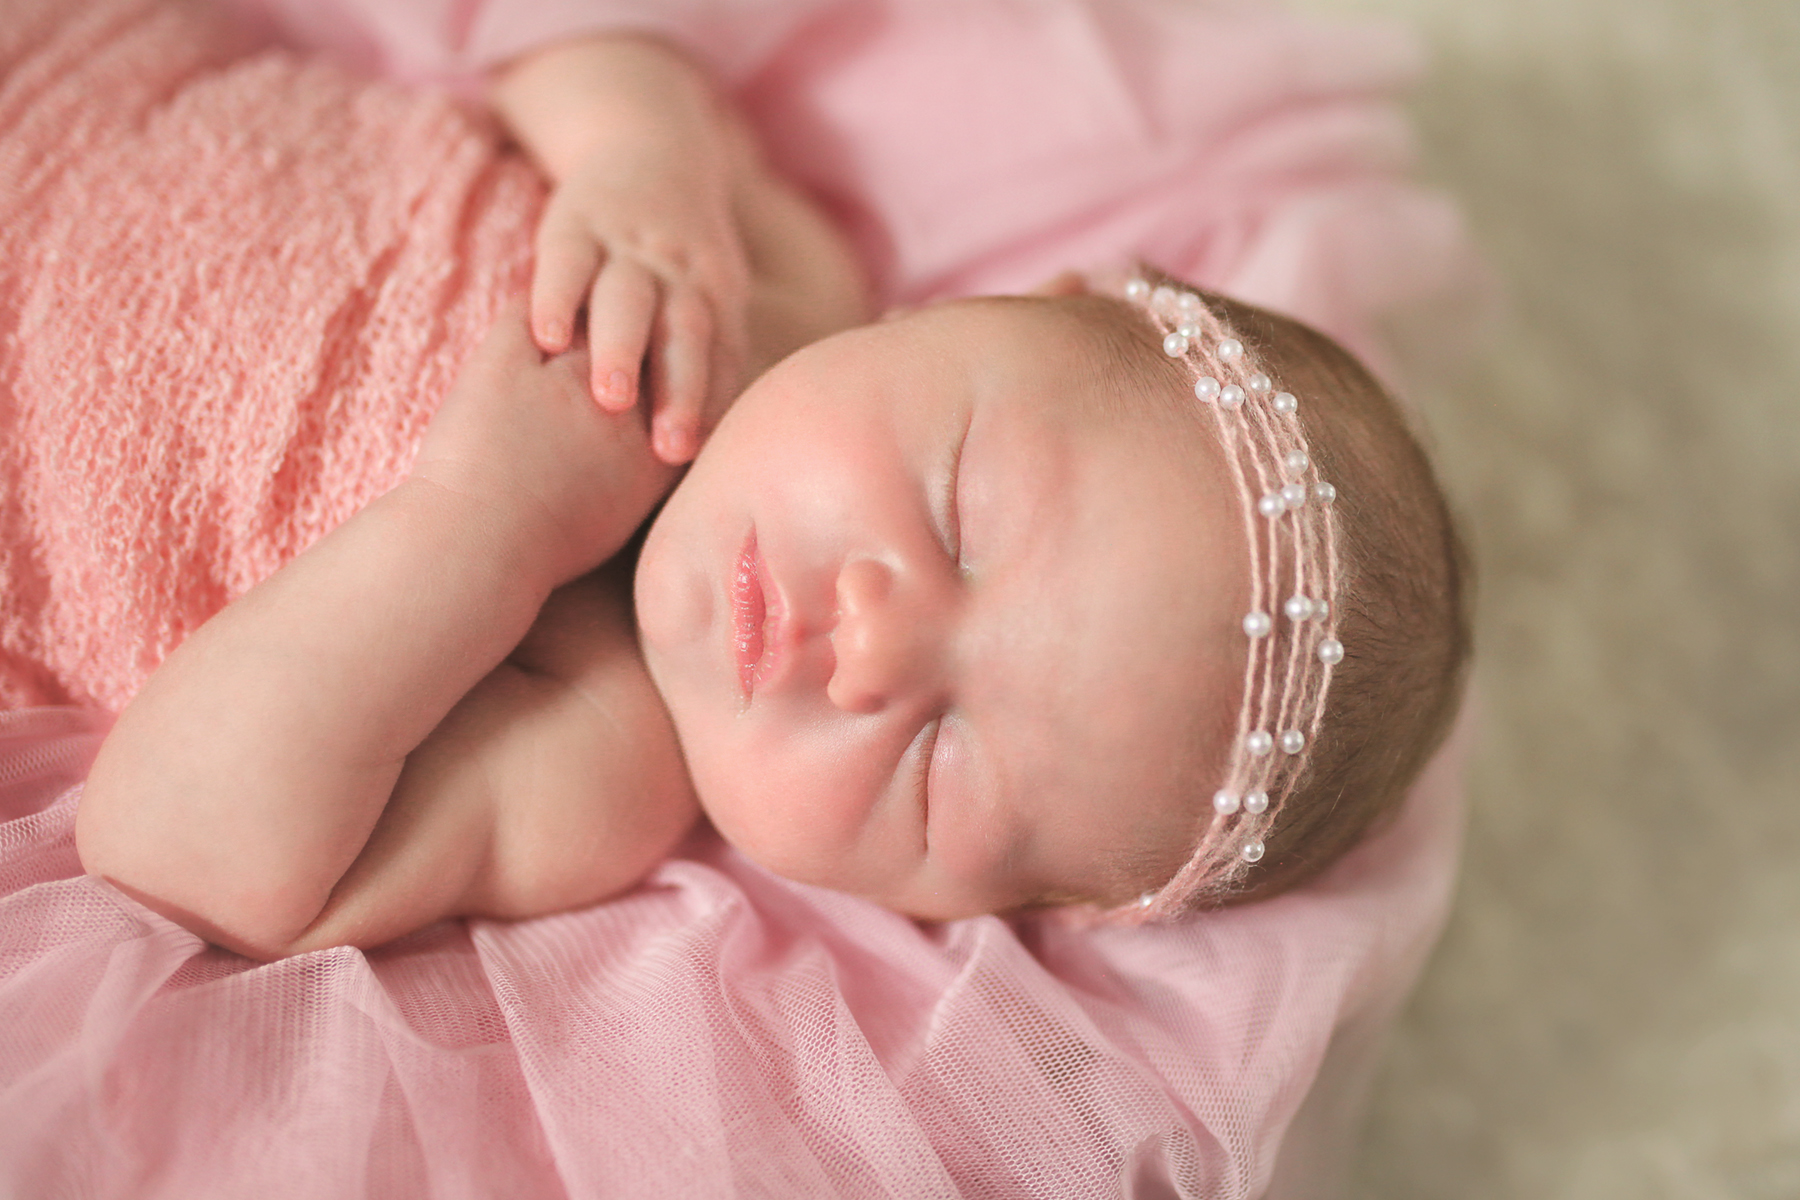 columbia-county-child-baby-photo-5